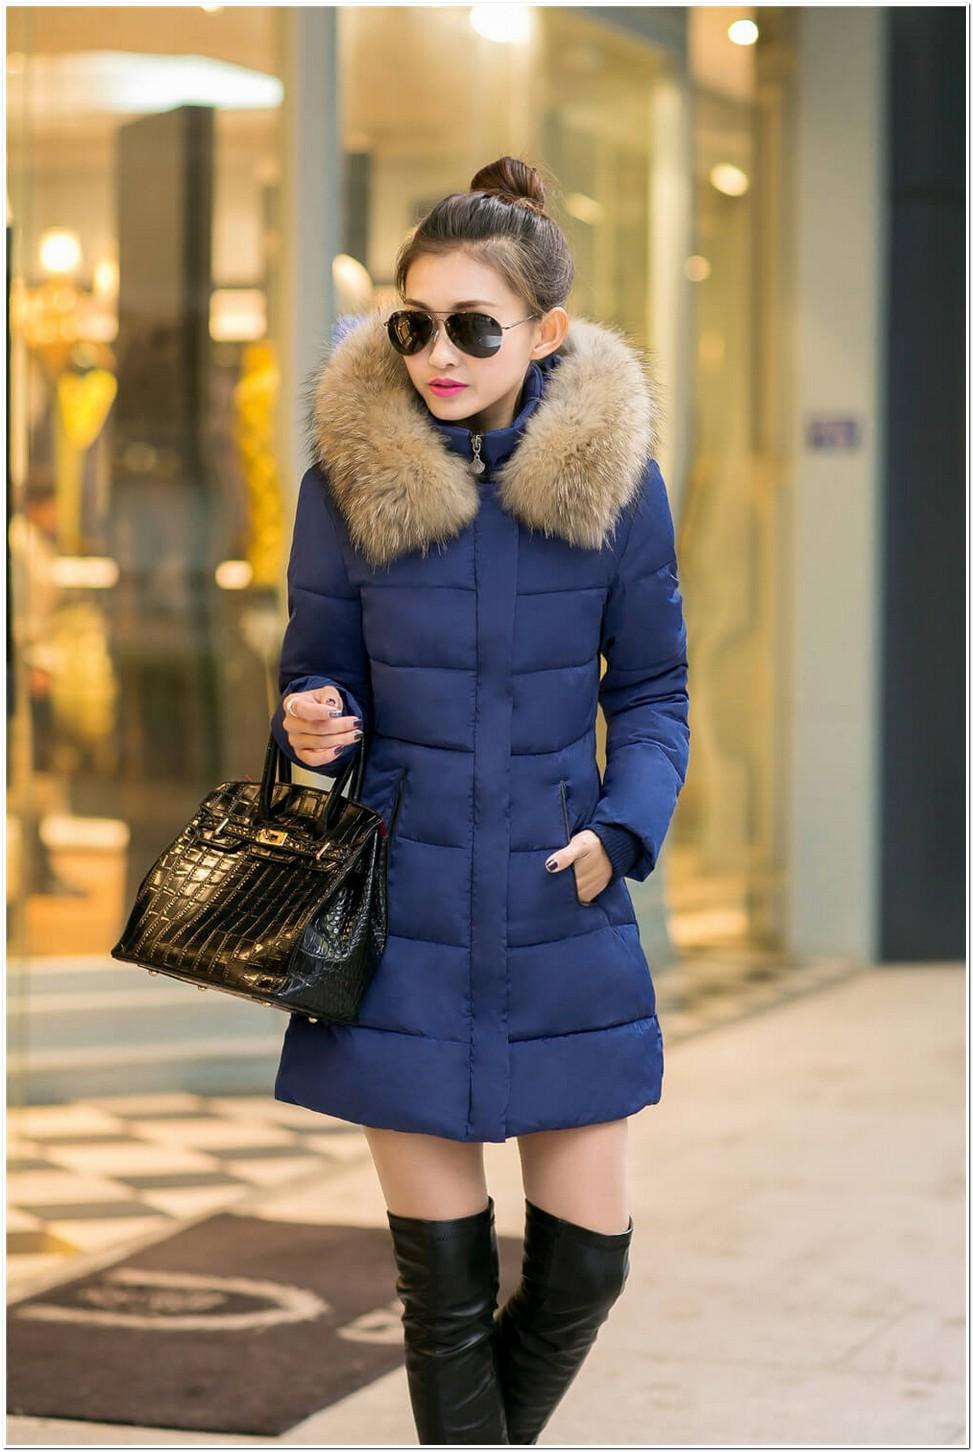 jaket gaya korea untuk wanita